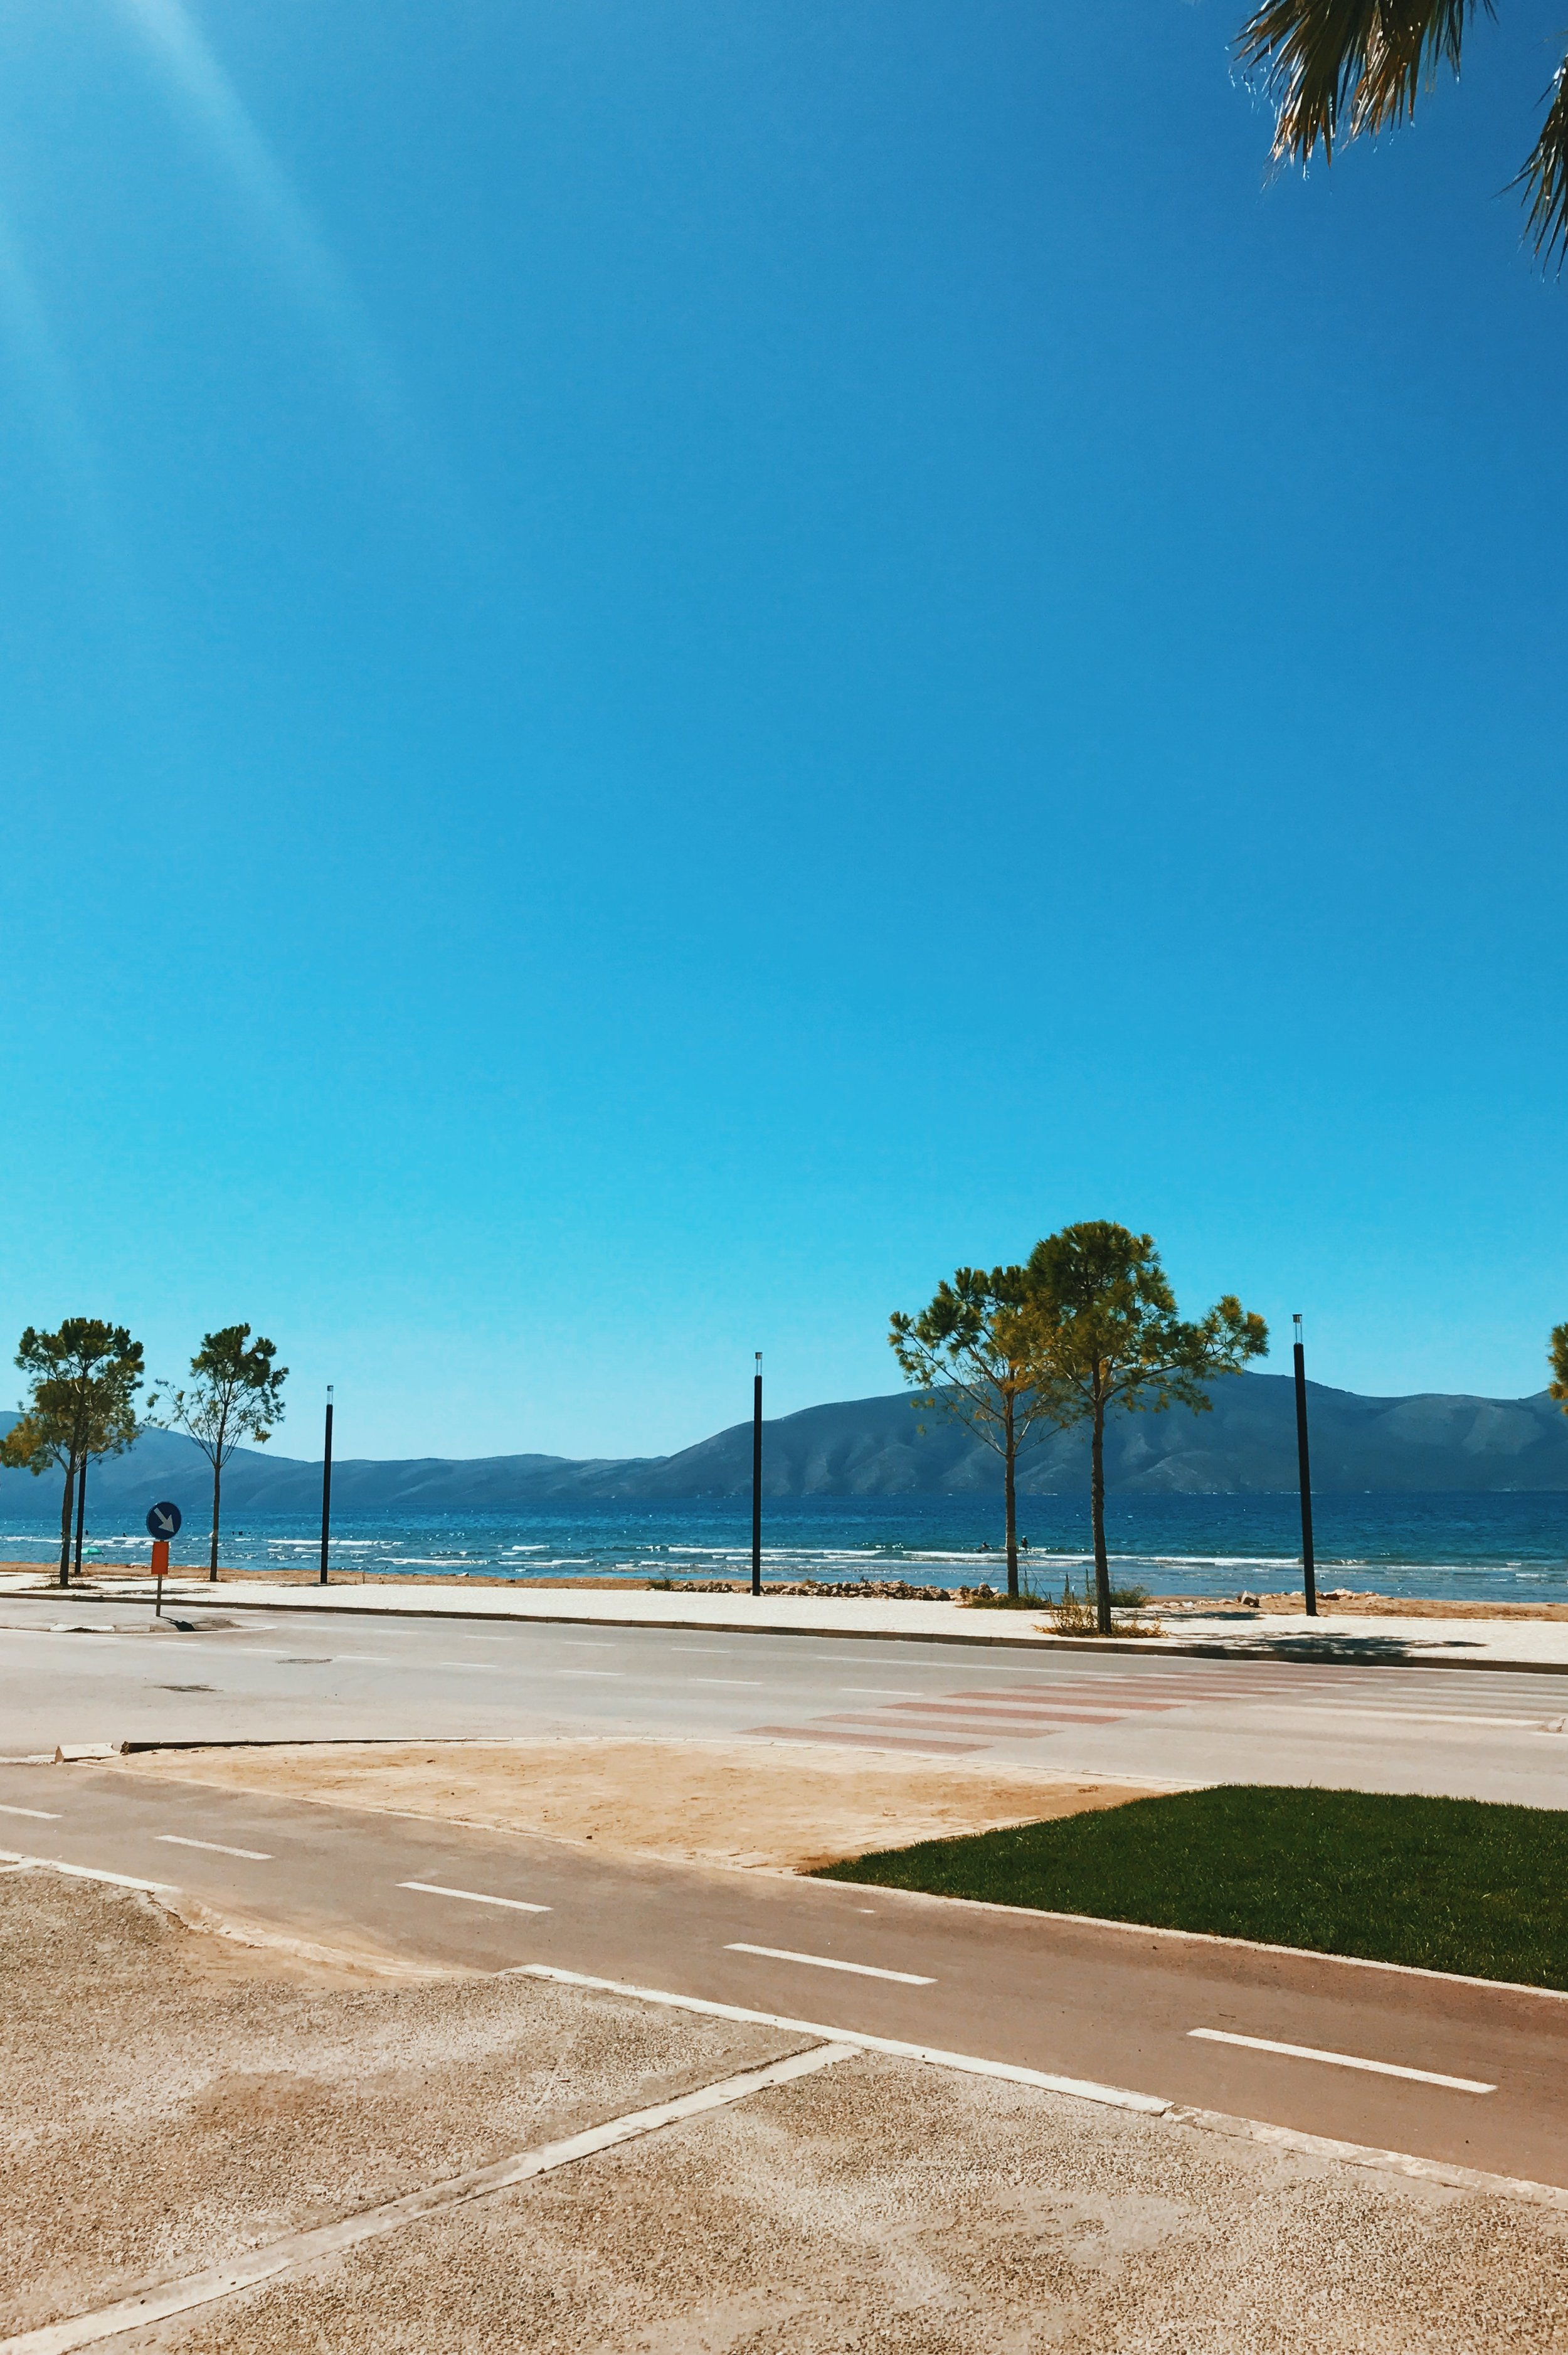 The sea in Vlorë, Albania